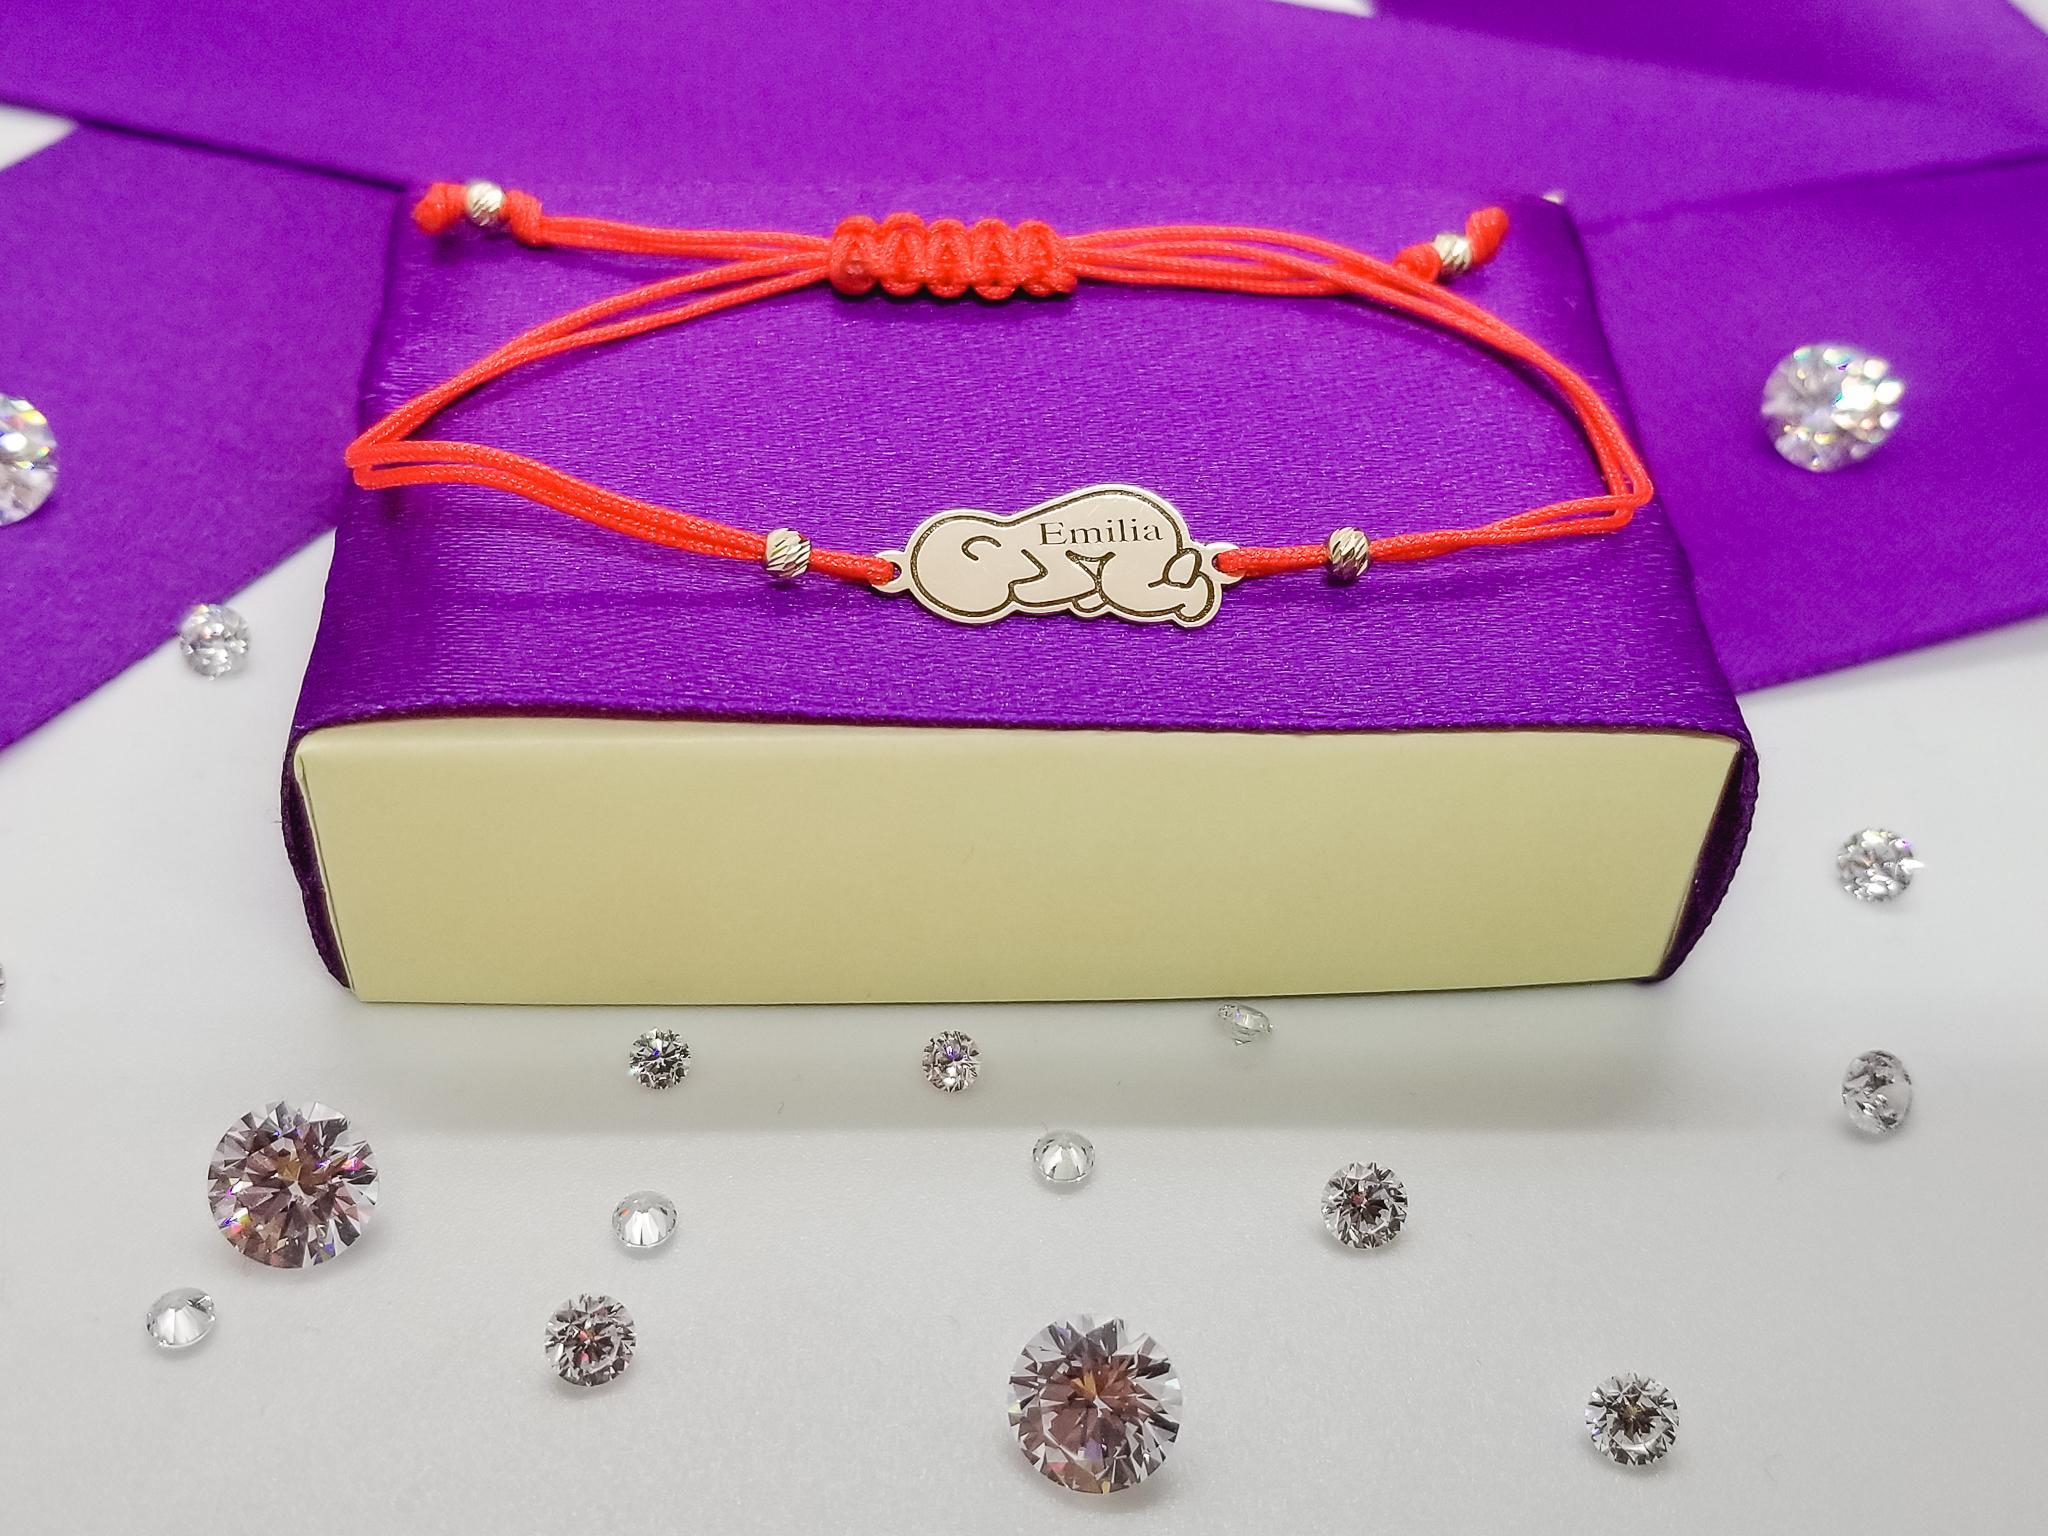 Bratara FATI 209 Bebelus din aur galben de 14K cu snur rosu.